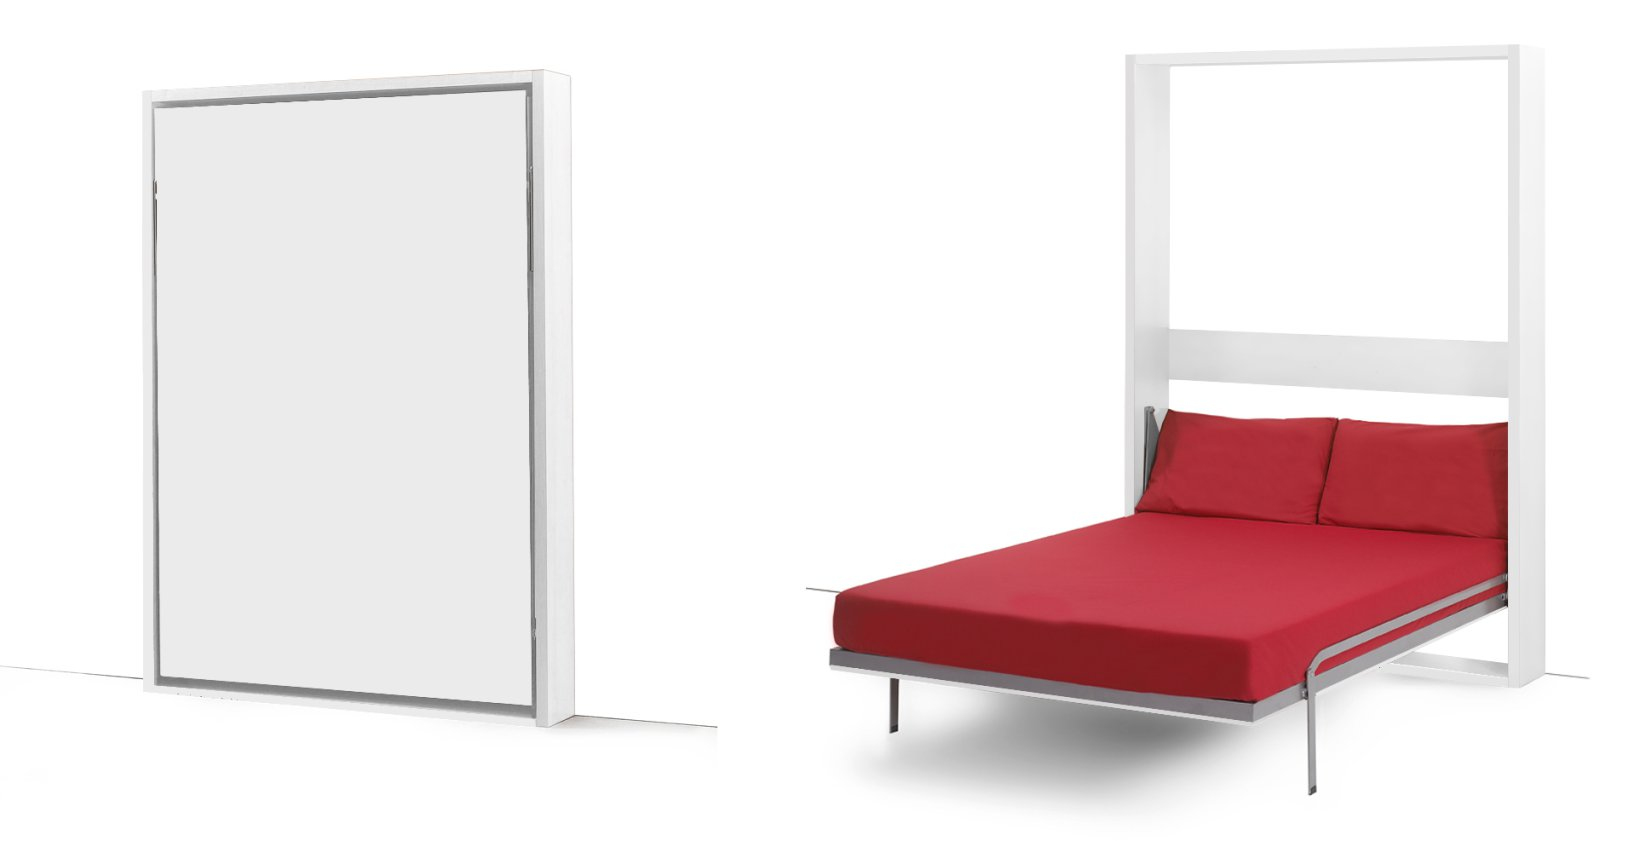 Lit Canapé Escamotable Ikea Inspirant Collection Page 15 Lit Categories